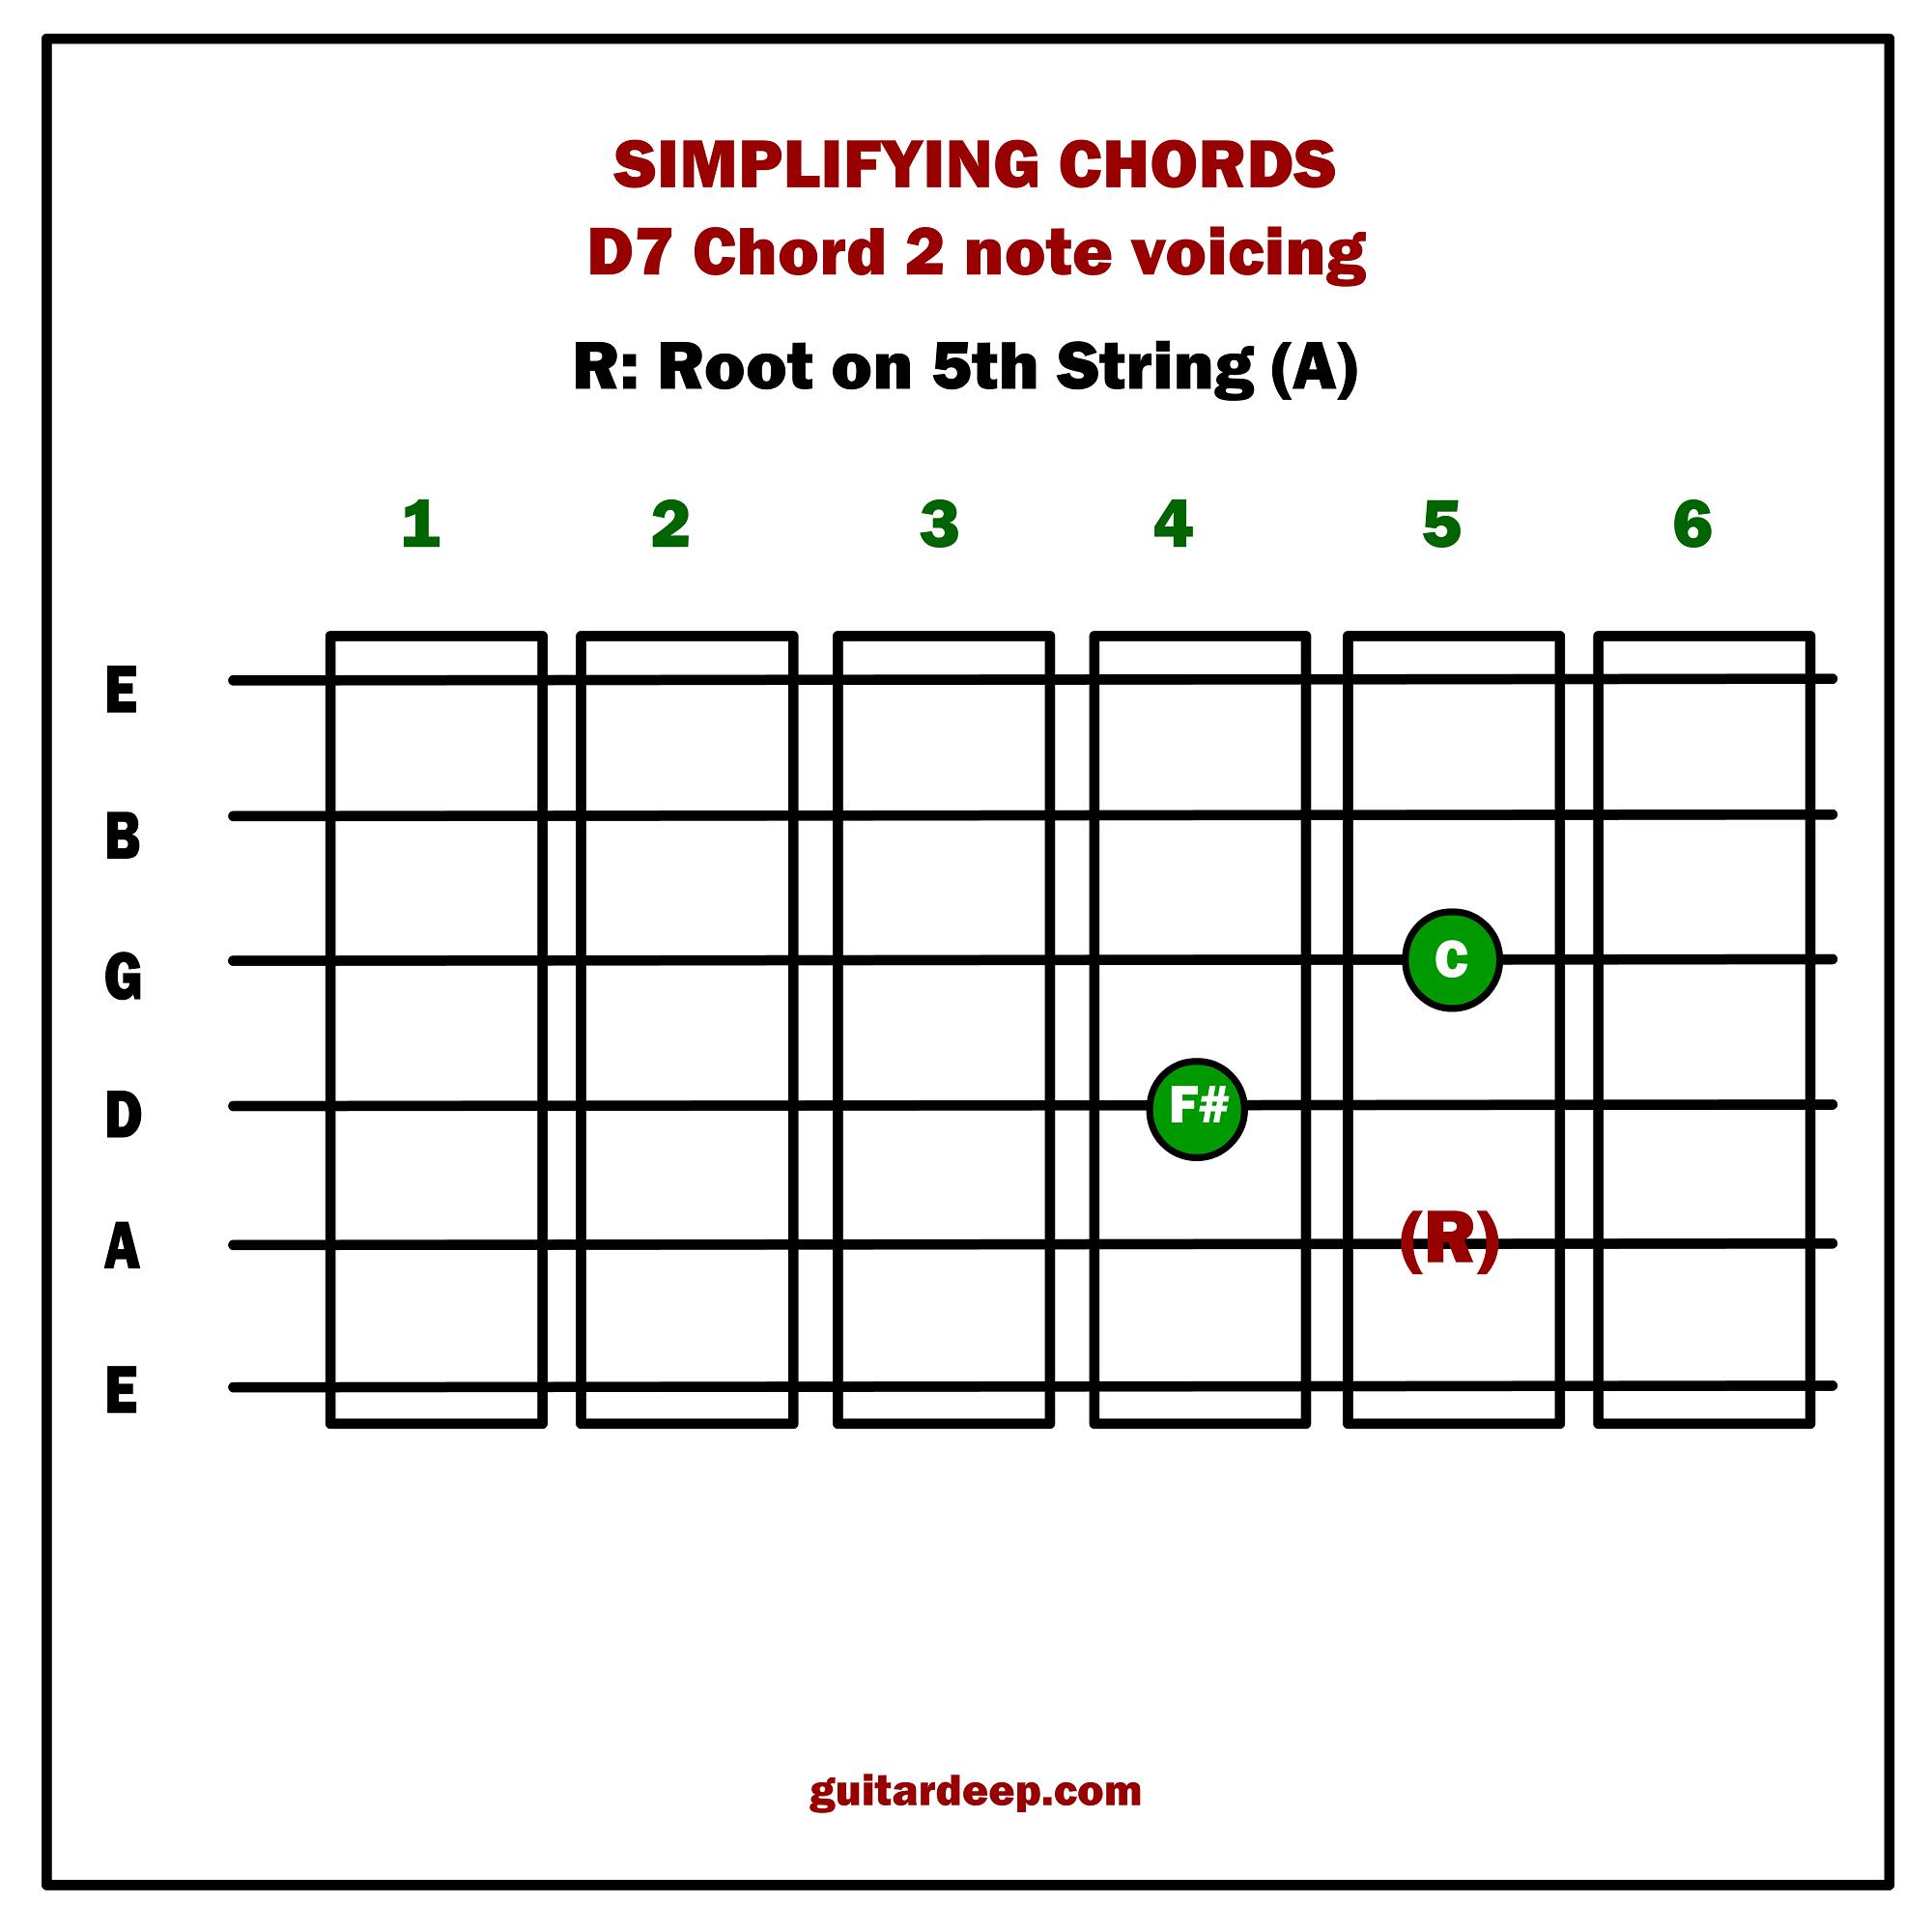 Lesson 07 Simplifying Guitar Chords Part 02 Guitar Deep